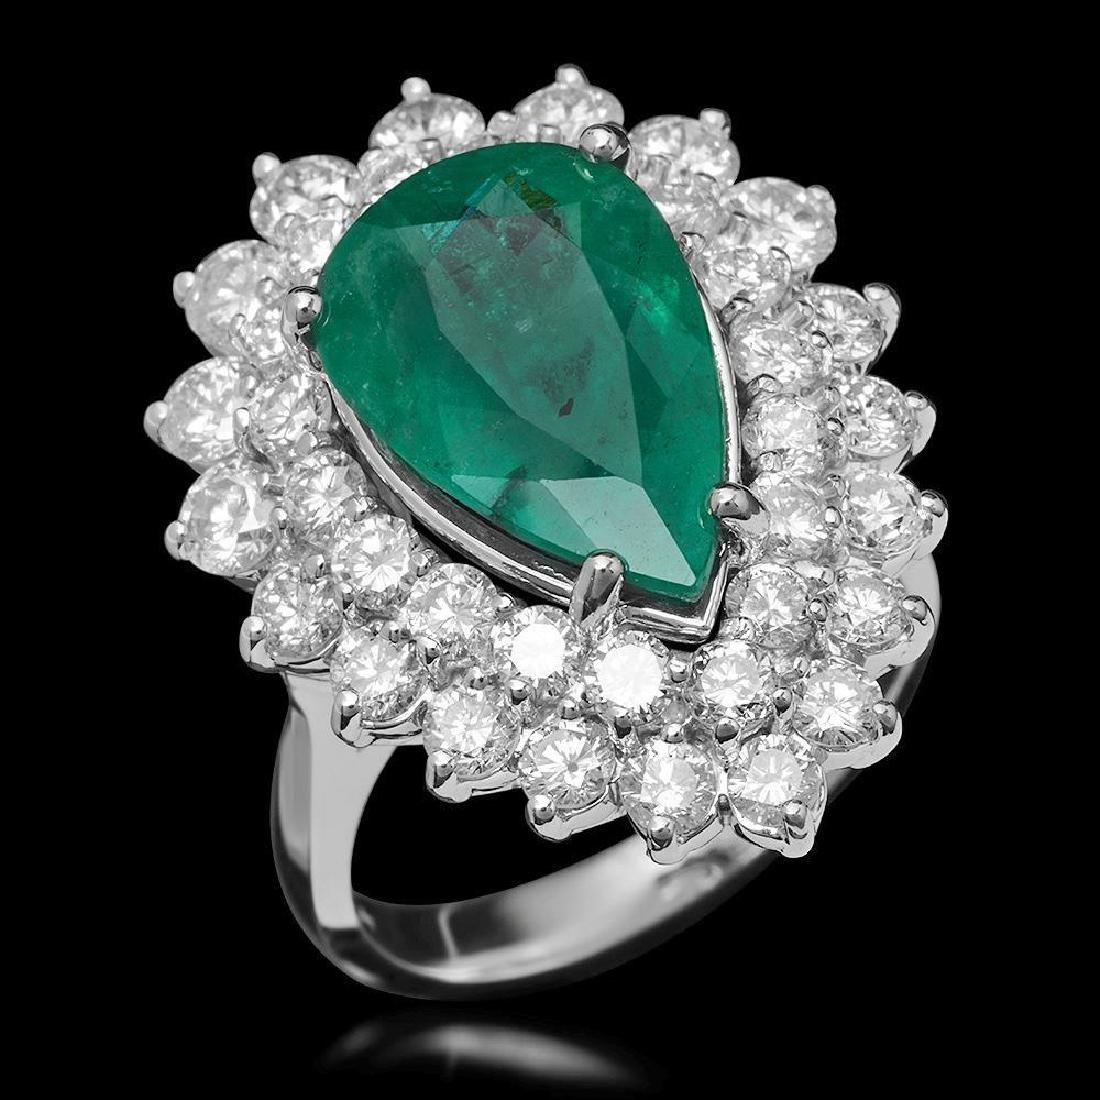 14K Gold 5.12ct Emerald & 2.75ct Diamond Ring